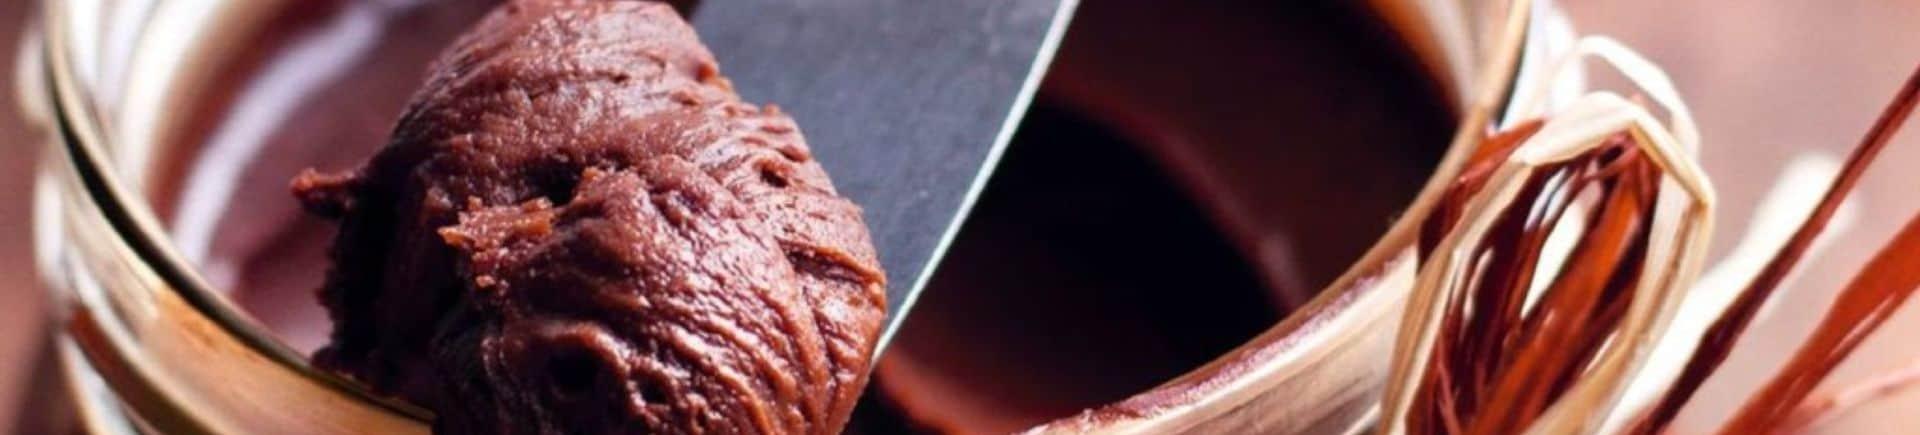 Milk Chocolate Spreads